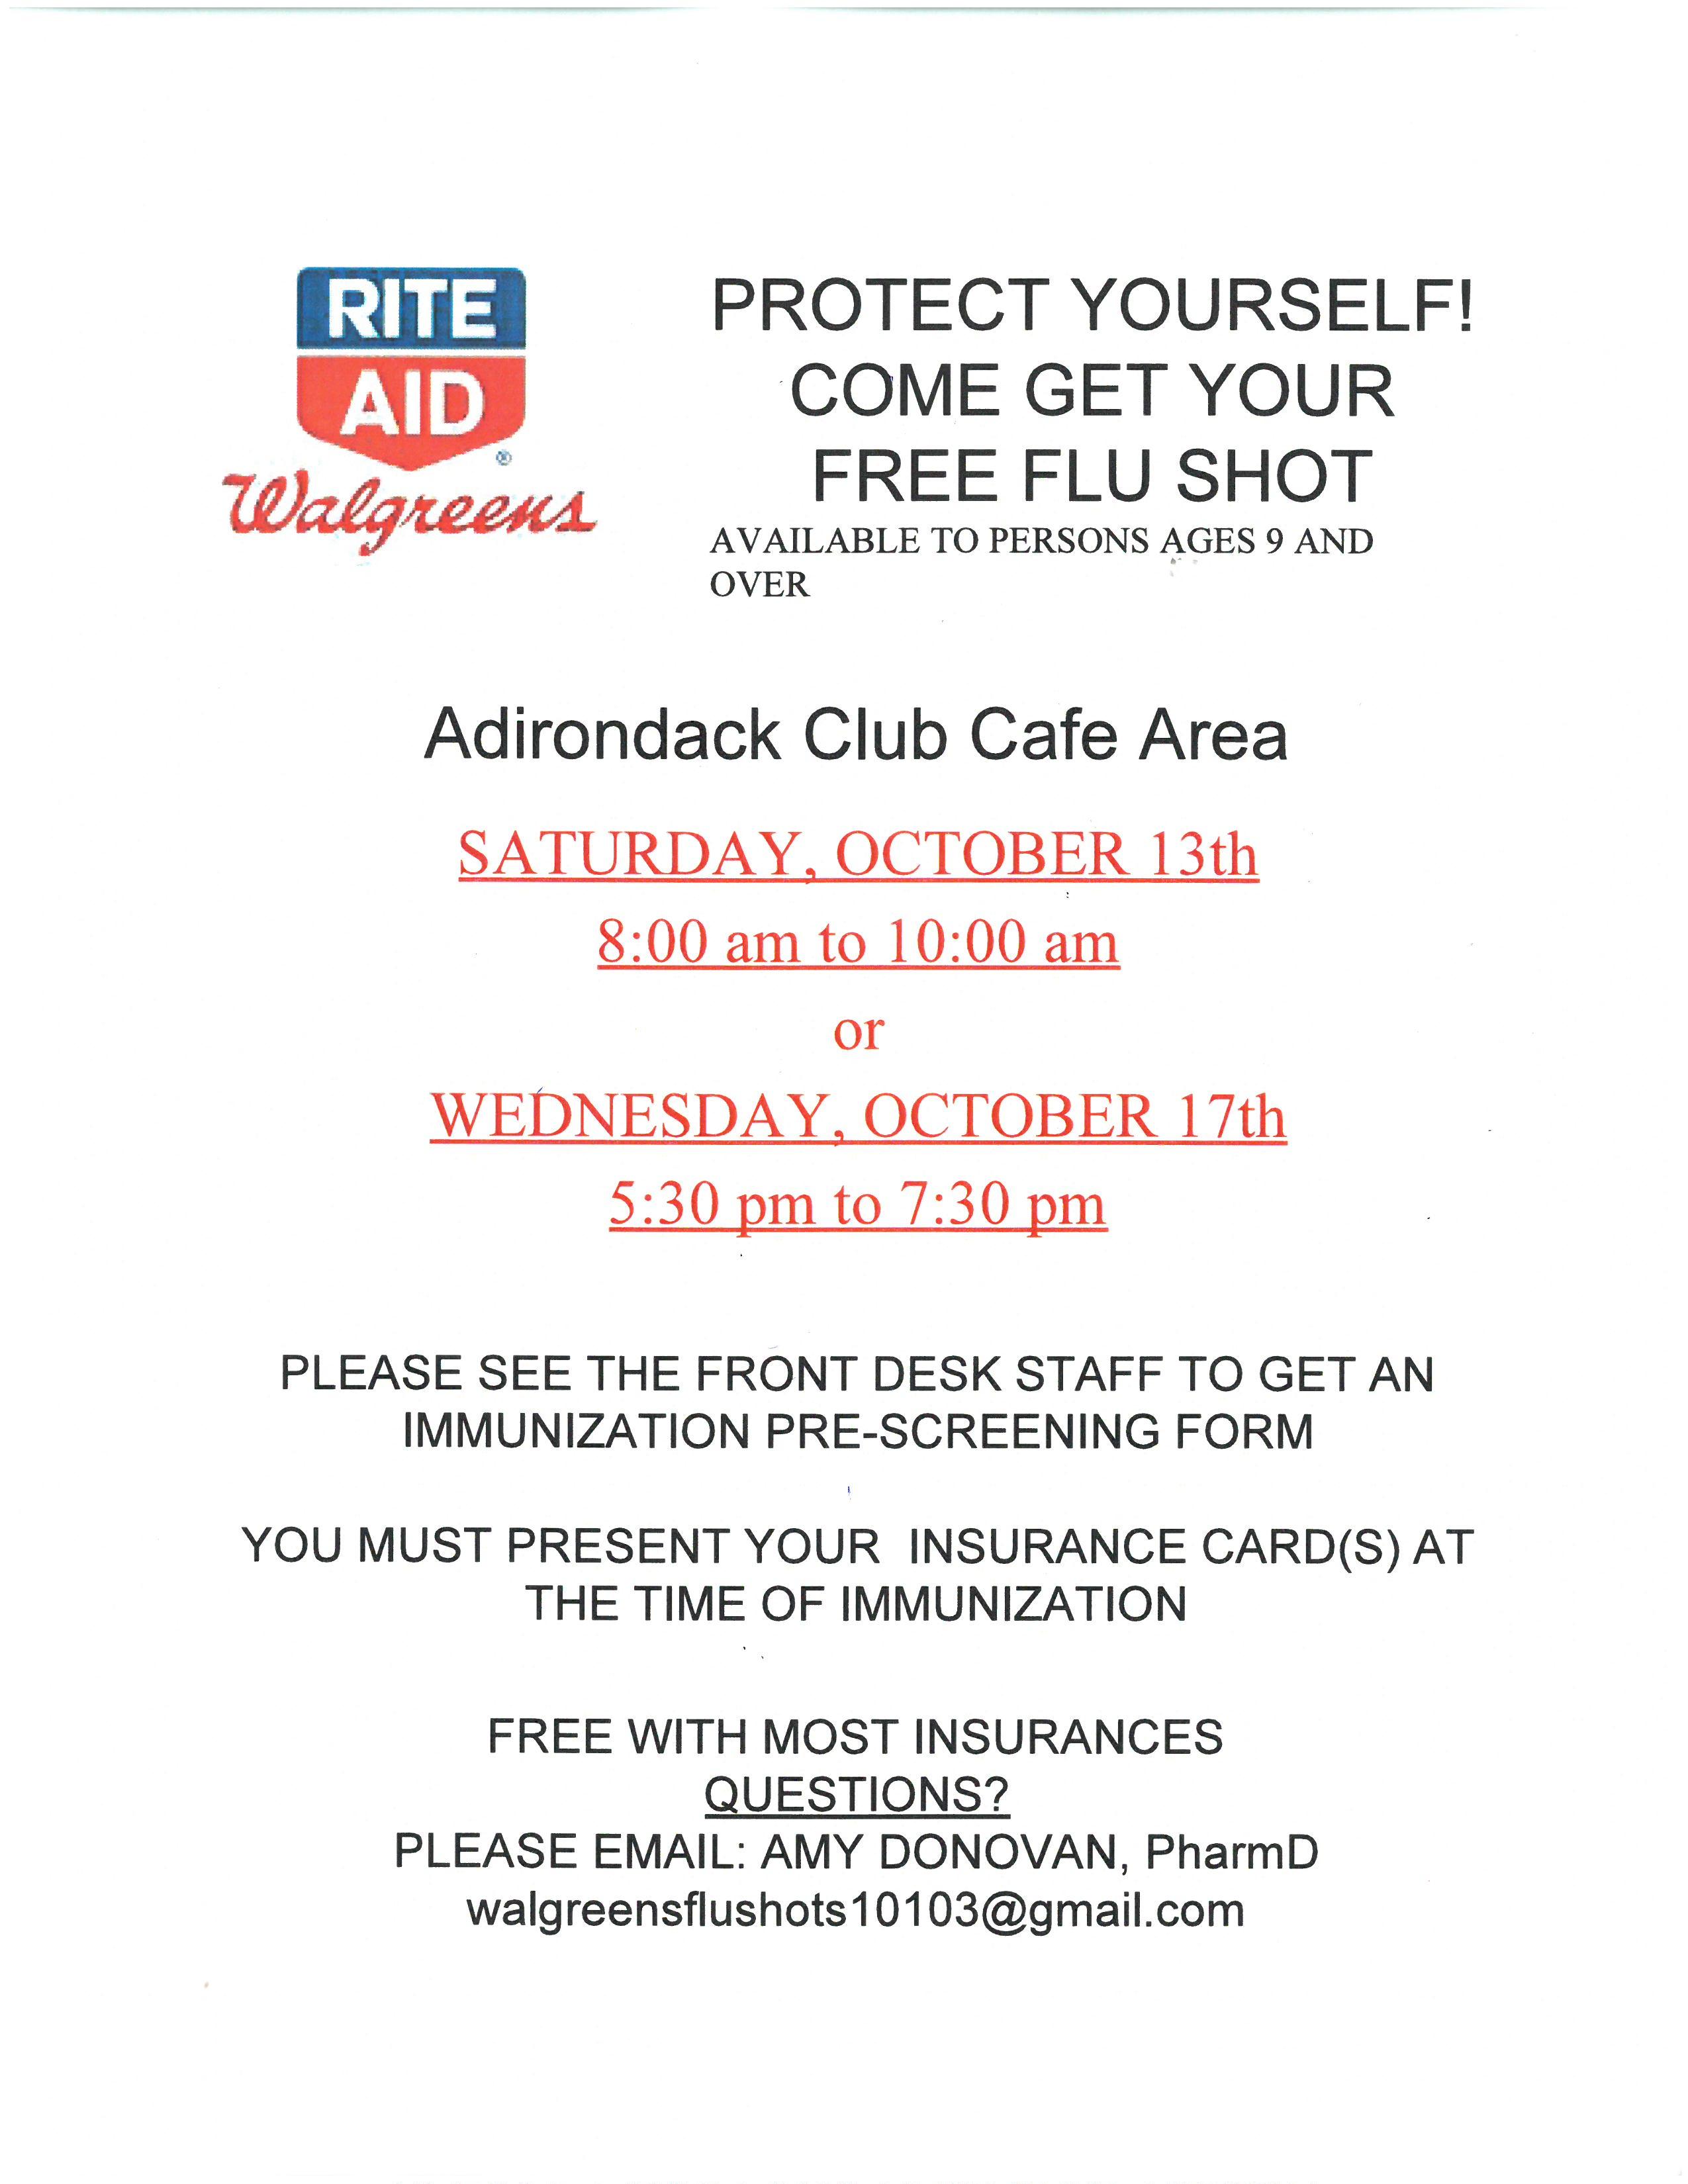 Flu Shot Clinics   Adirondack Club